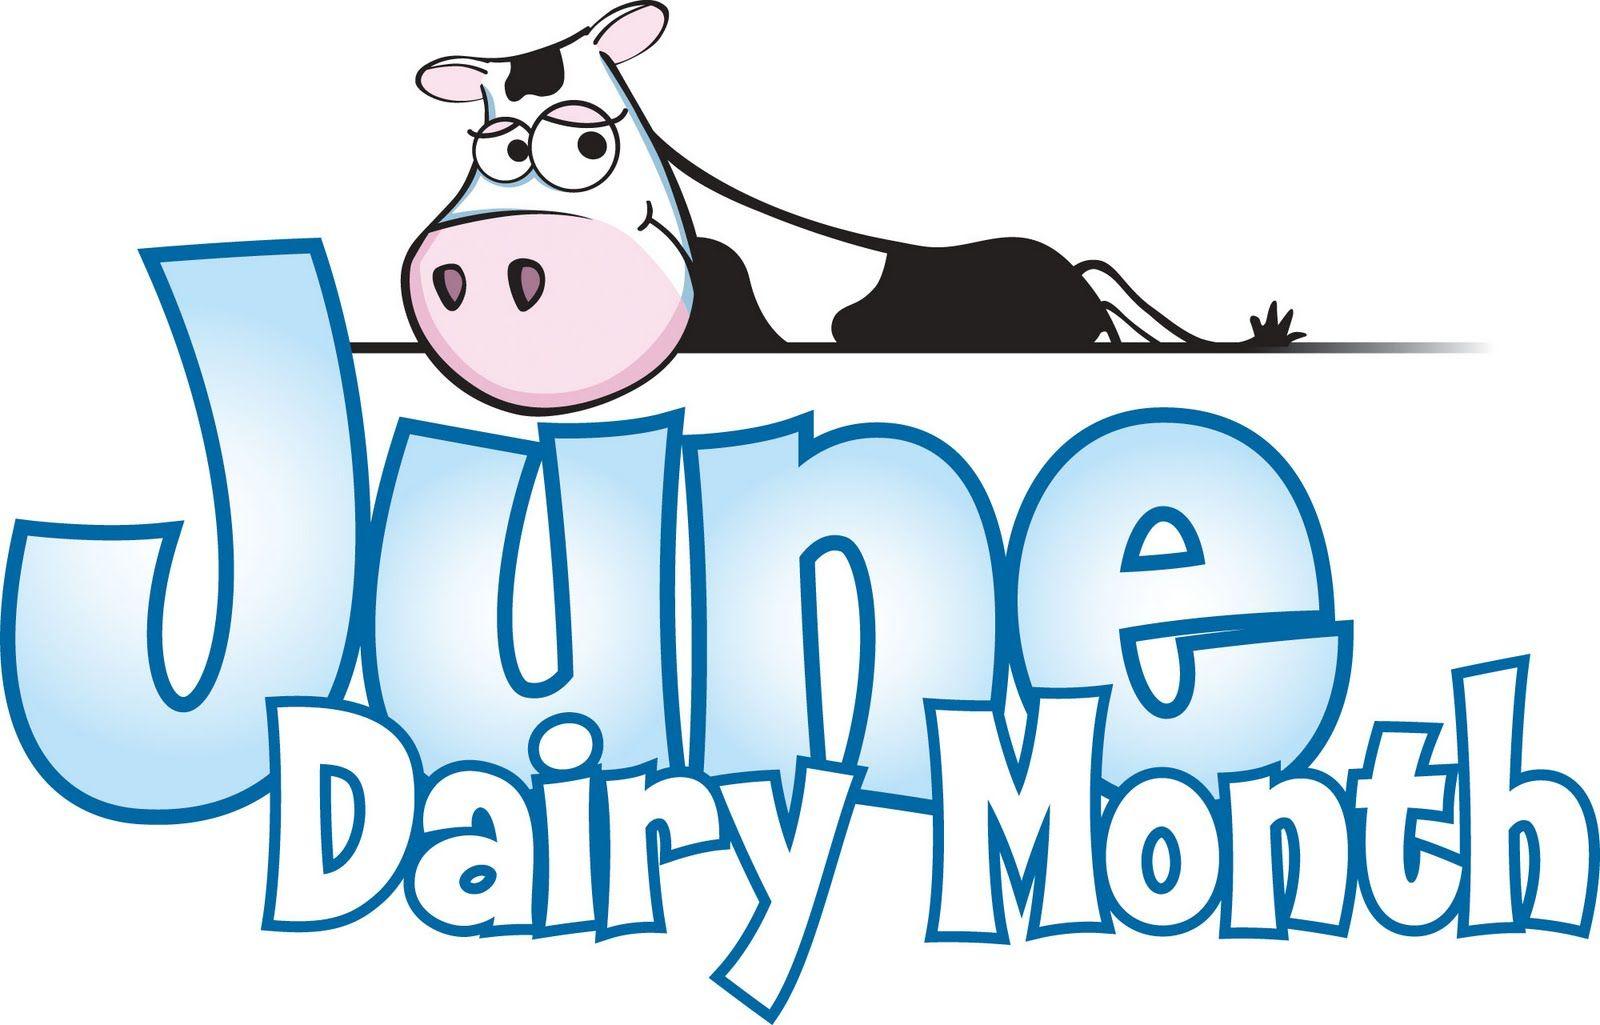 June Dairy Month Cheesy Pleasing Recipe.